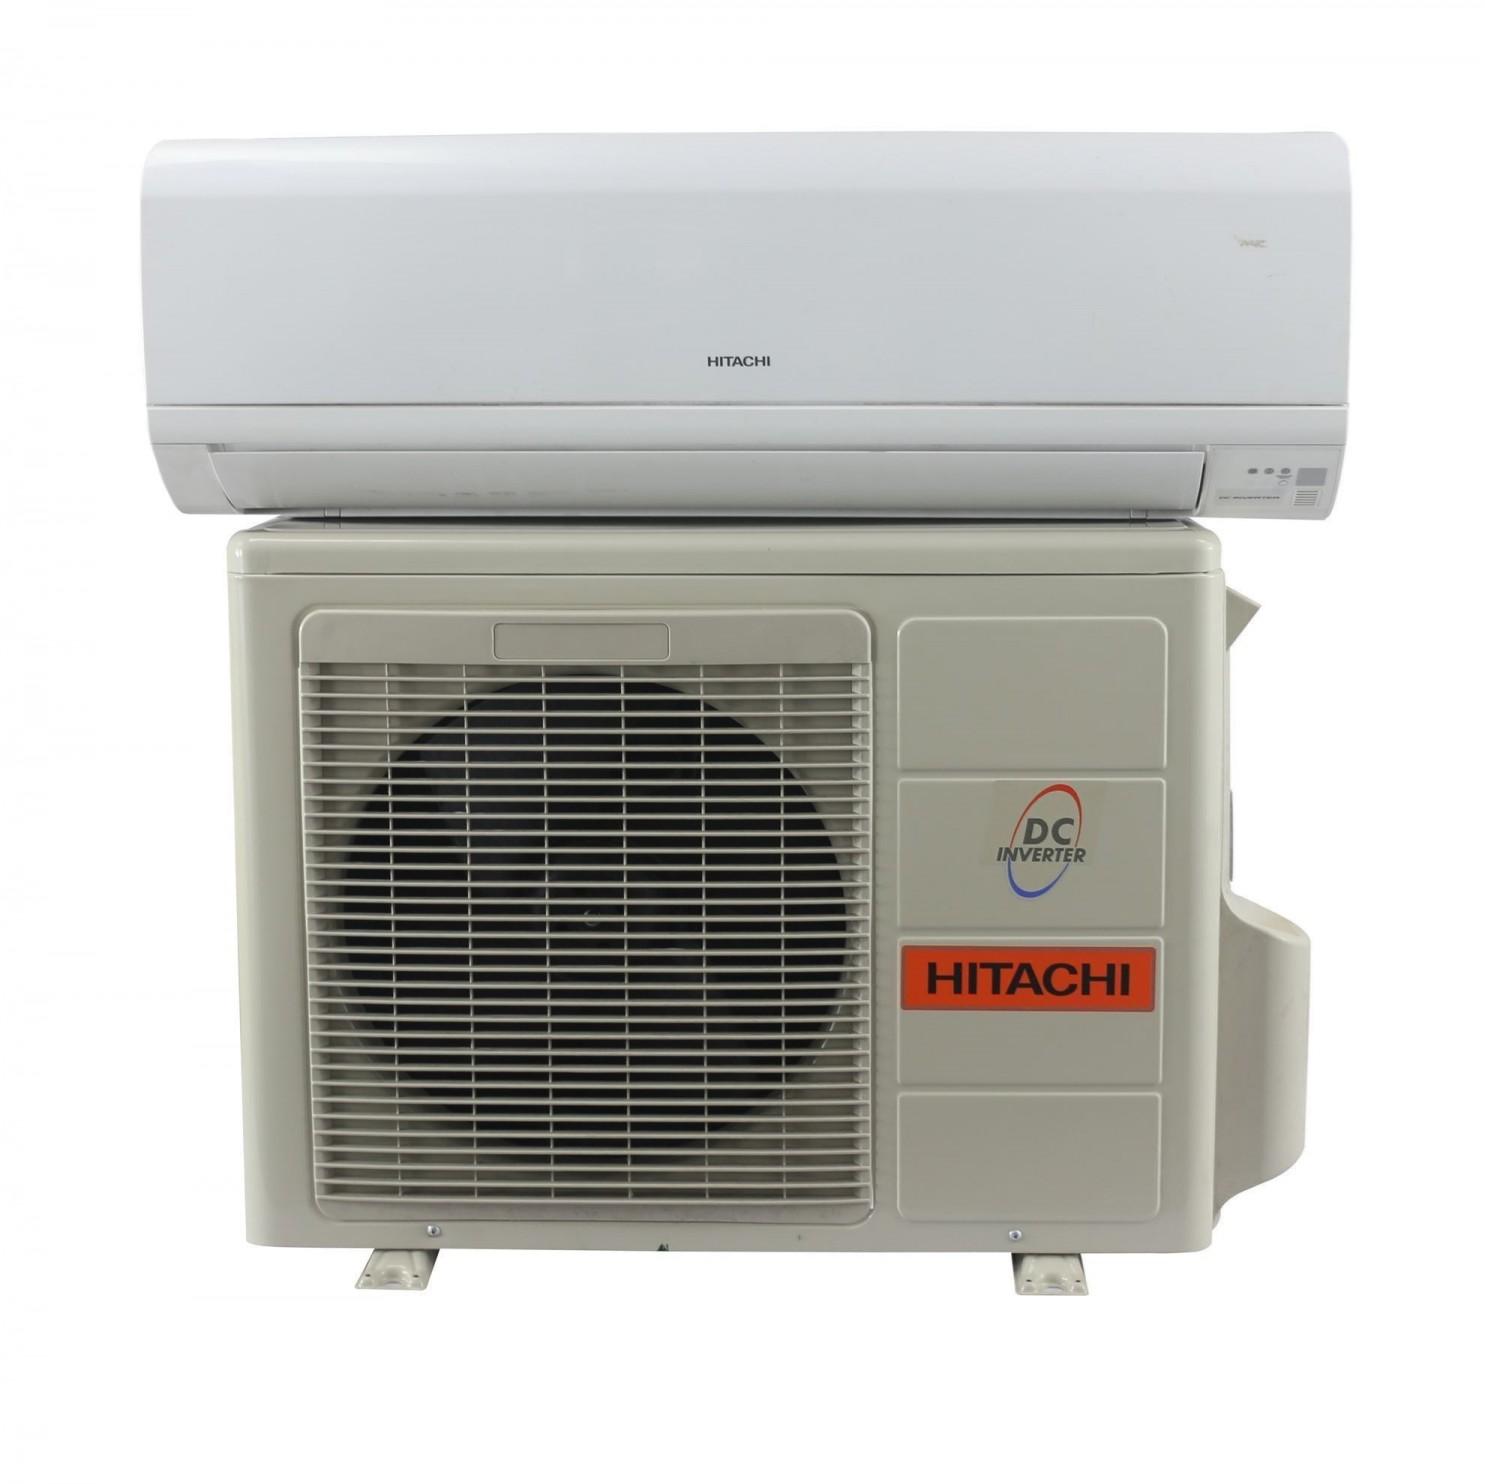 Hitachi air conditioner price in Bangladesh